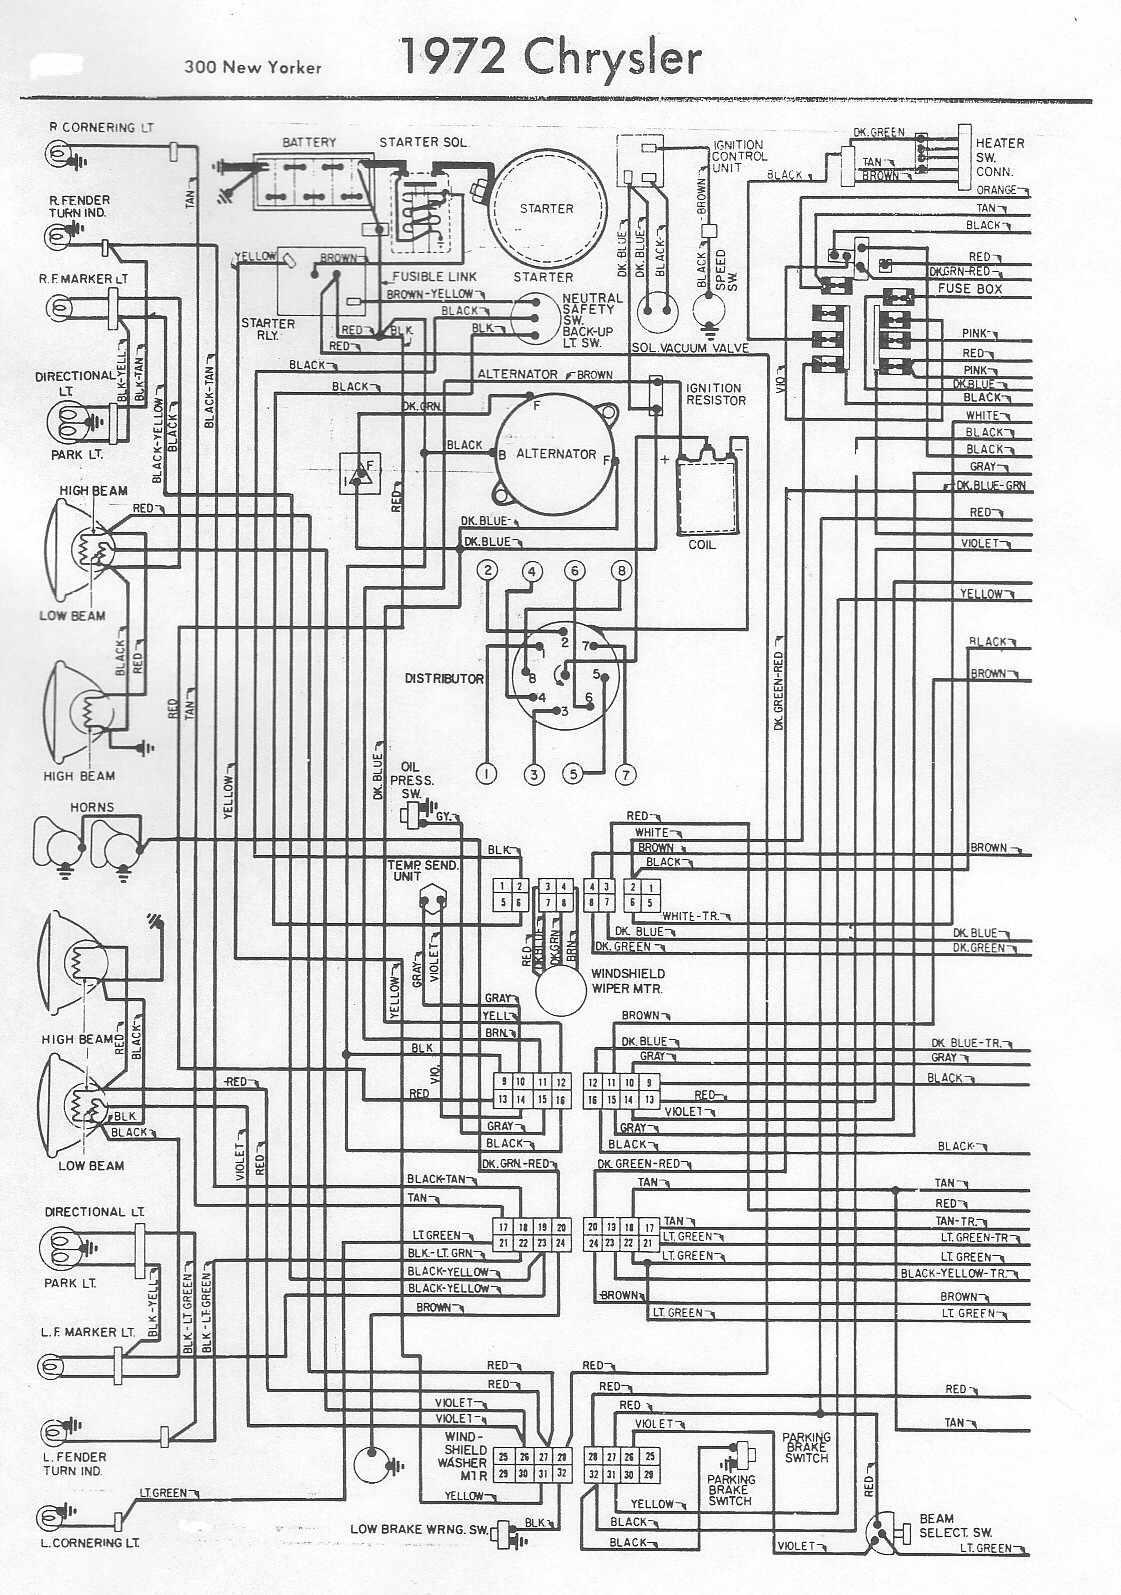 hight resolution of 1968 chrysler wiring diagram wiring diagram third level 1966 chrysler 300 1966 chrysler new yorker wiring